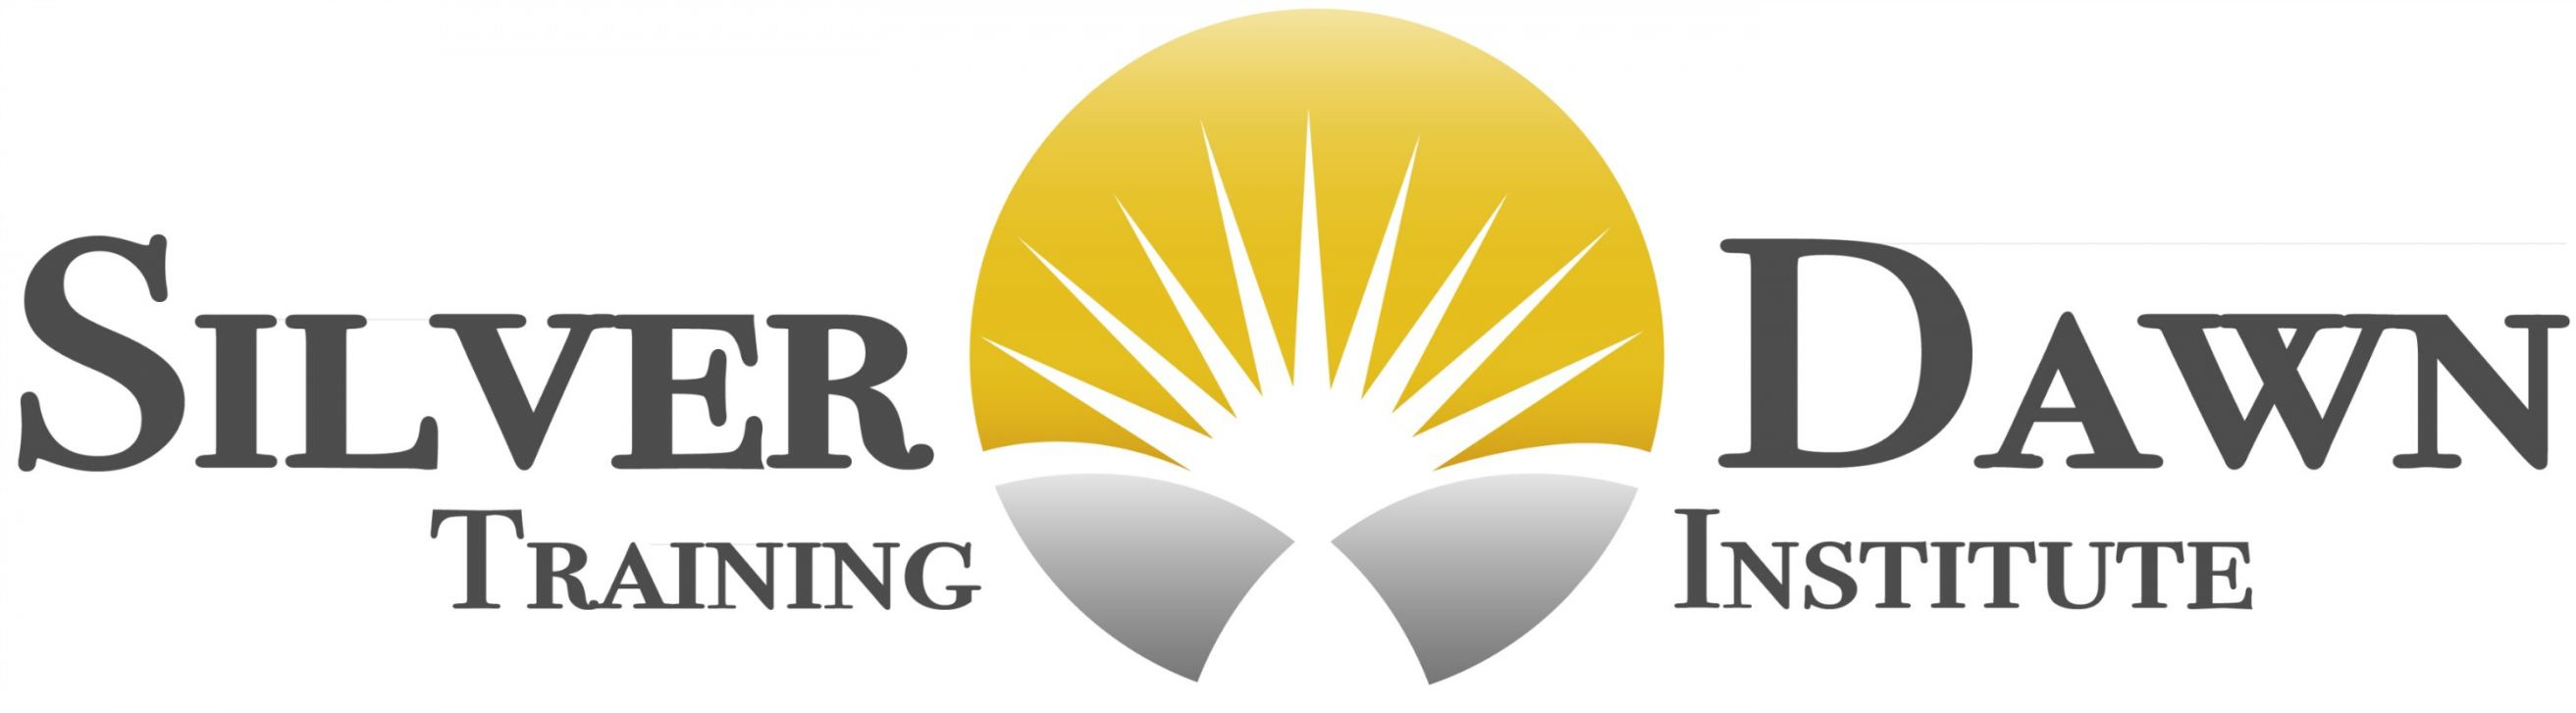 Silver Dawn Training Institute Logo